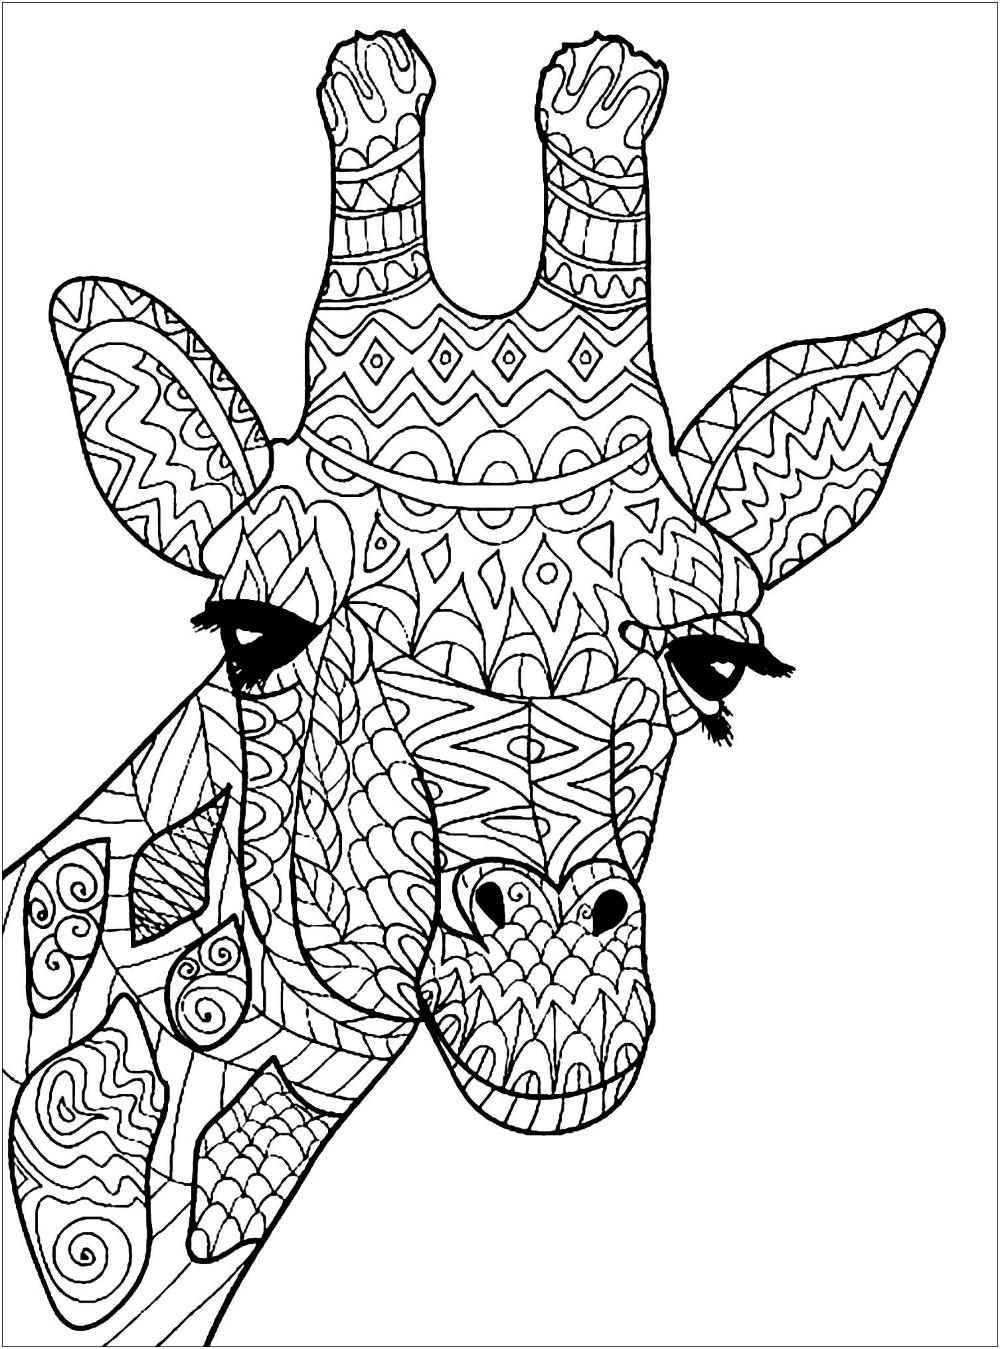 Color This Beautiful Giraffe Head With Cute Patterns Giraffe Coloring Pages Animal Coloring Pages Giraffe Colors